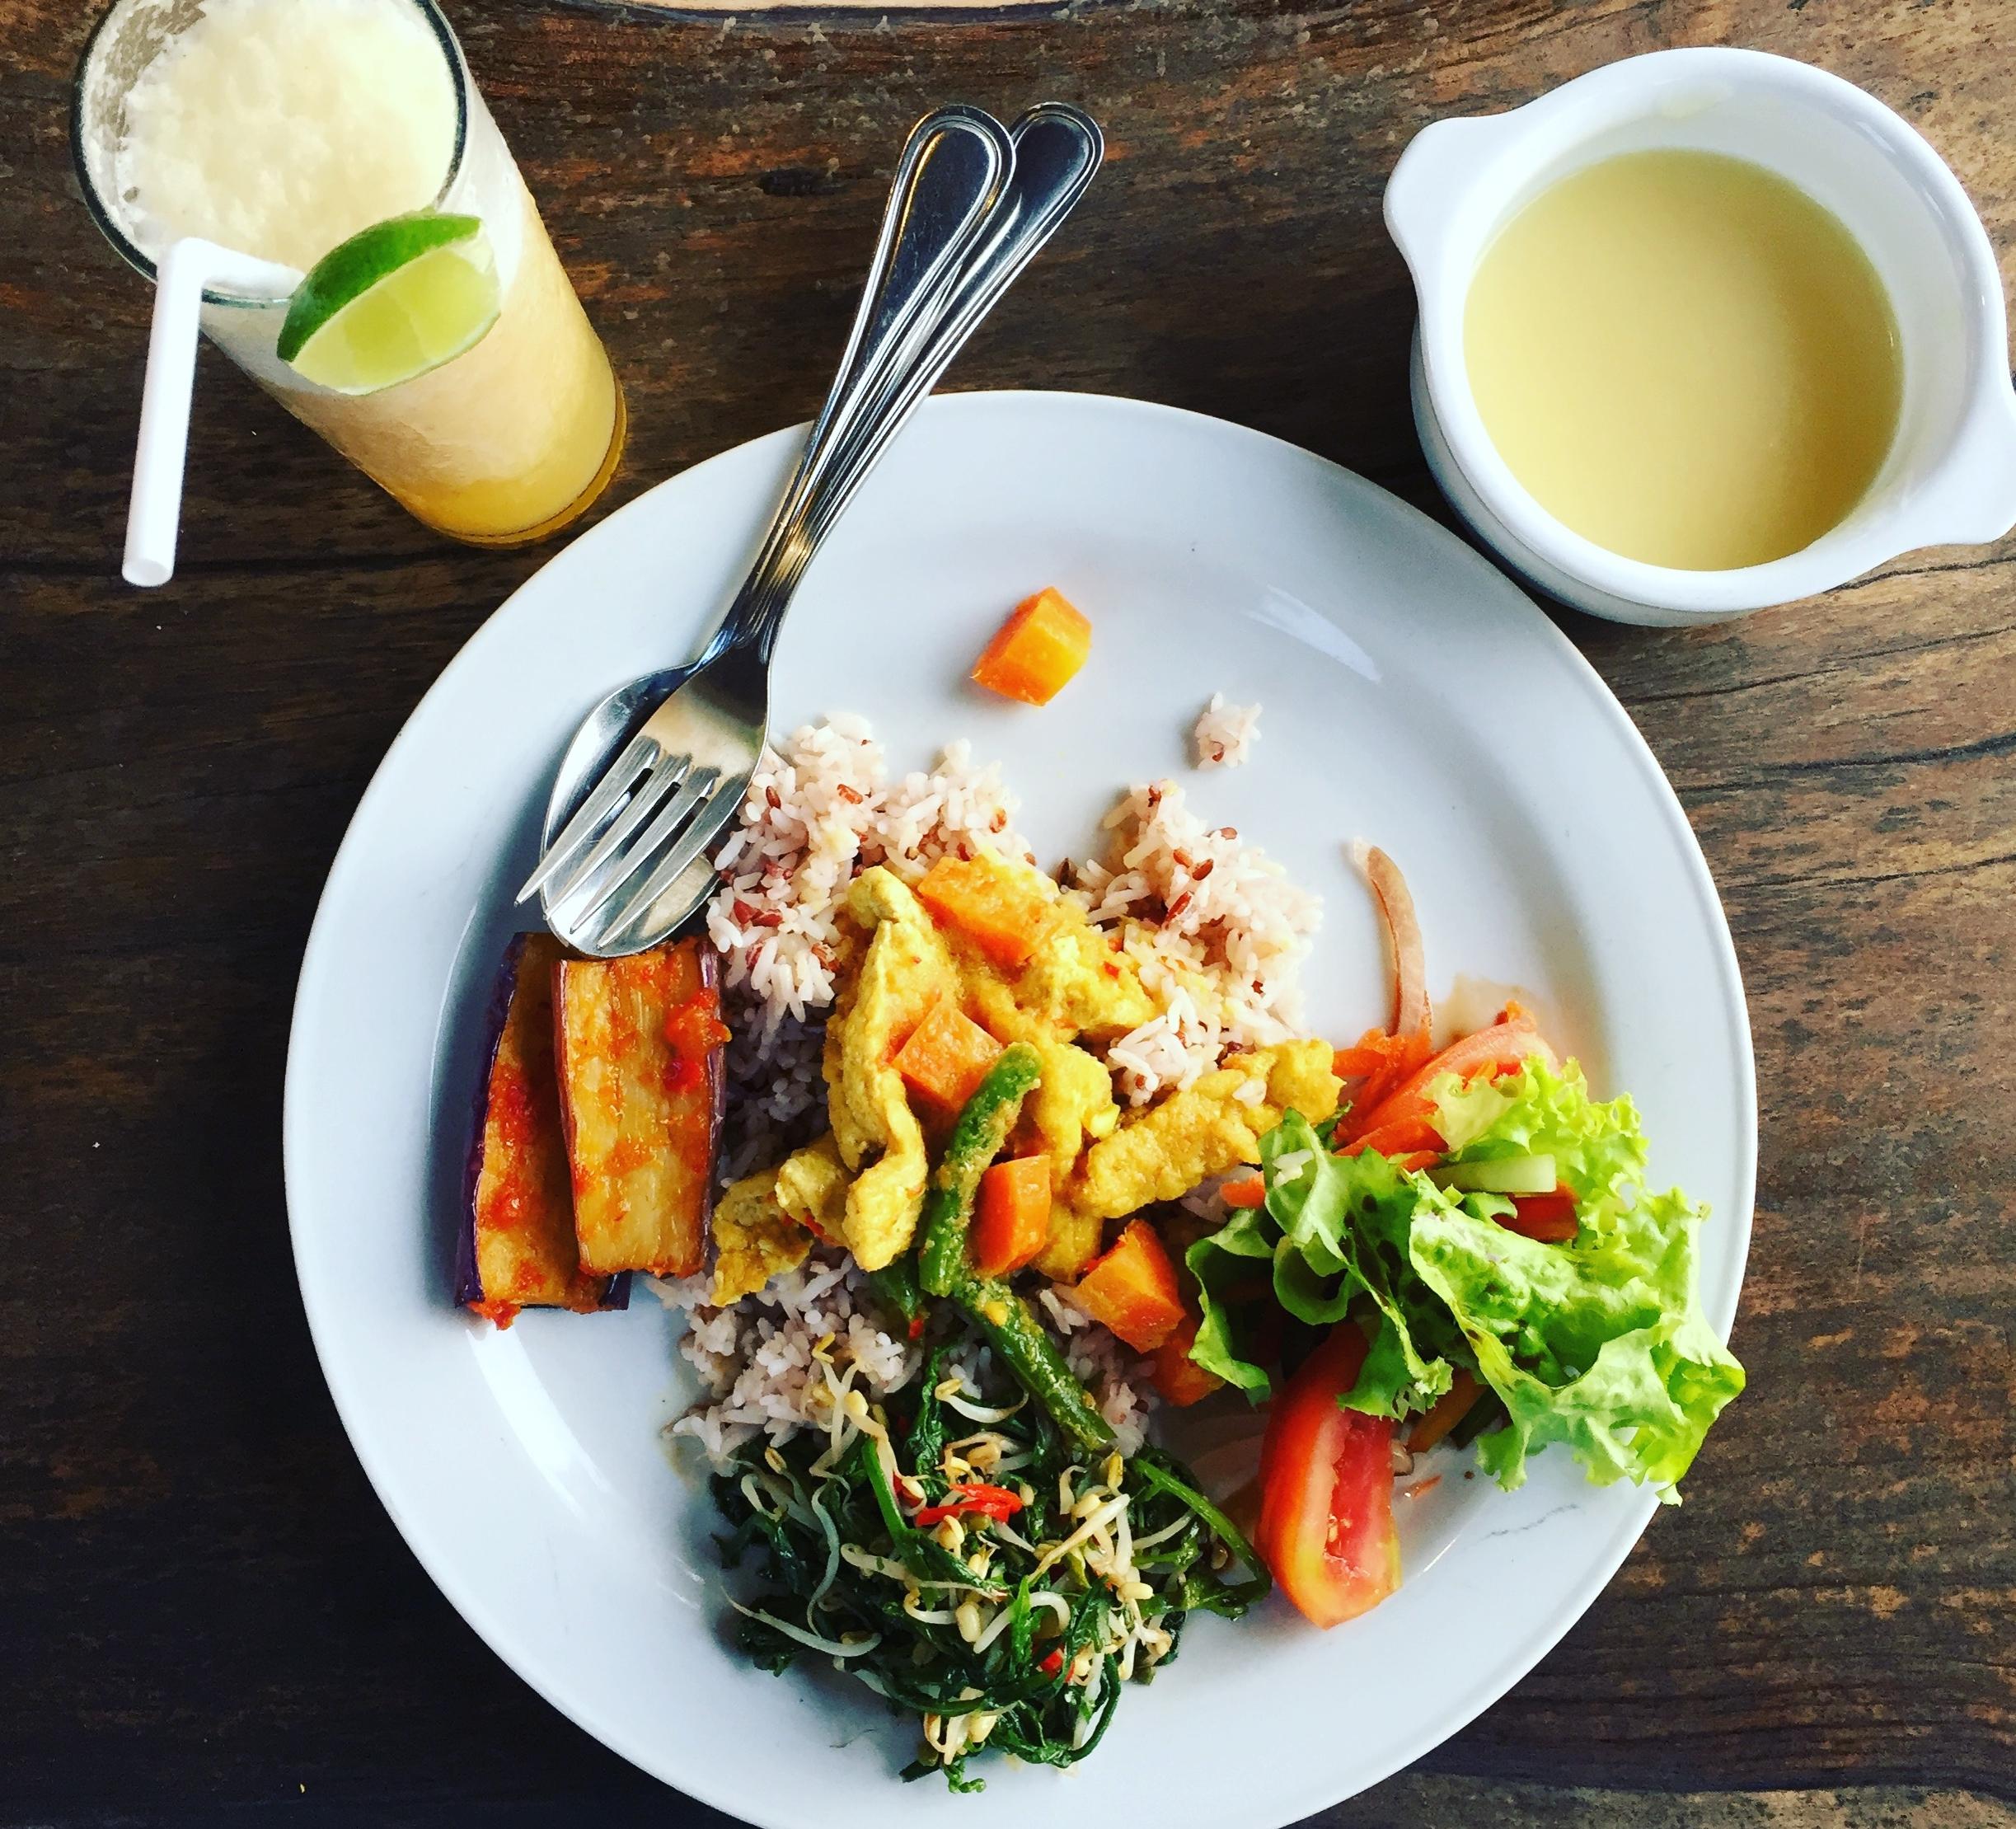 bali-yoga-teacher-training-foods.JPG